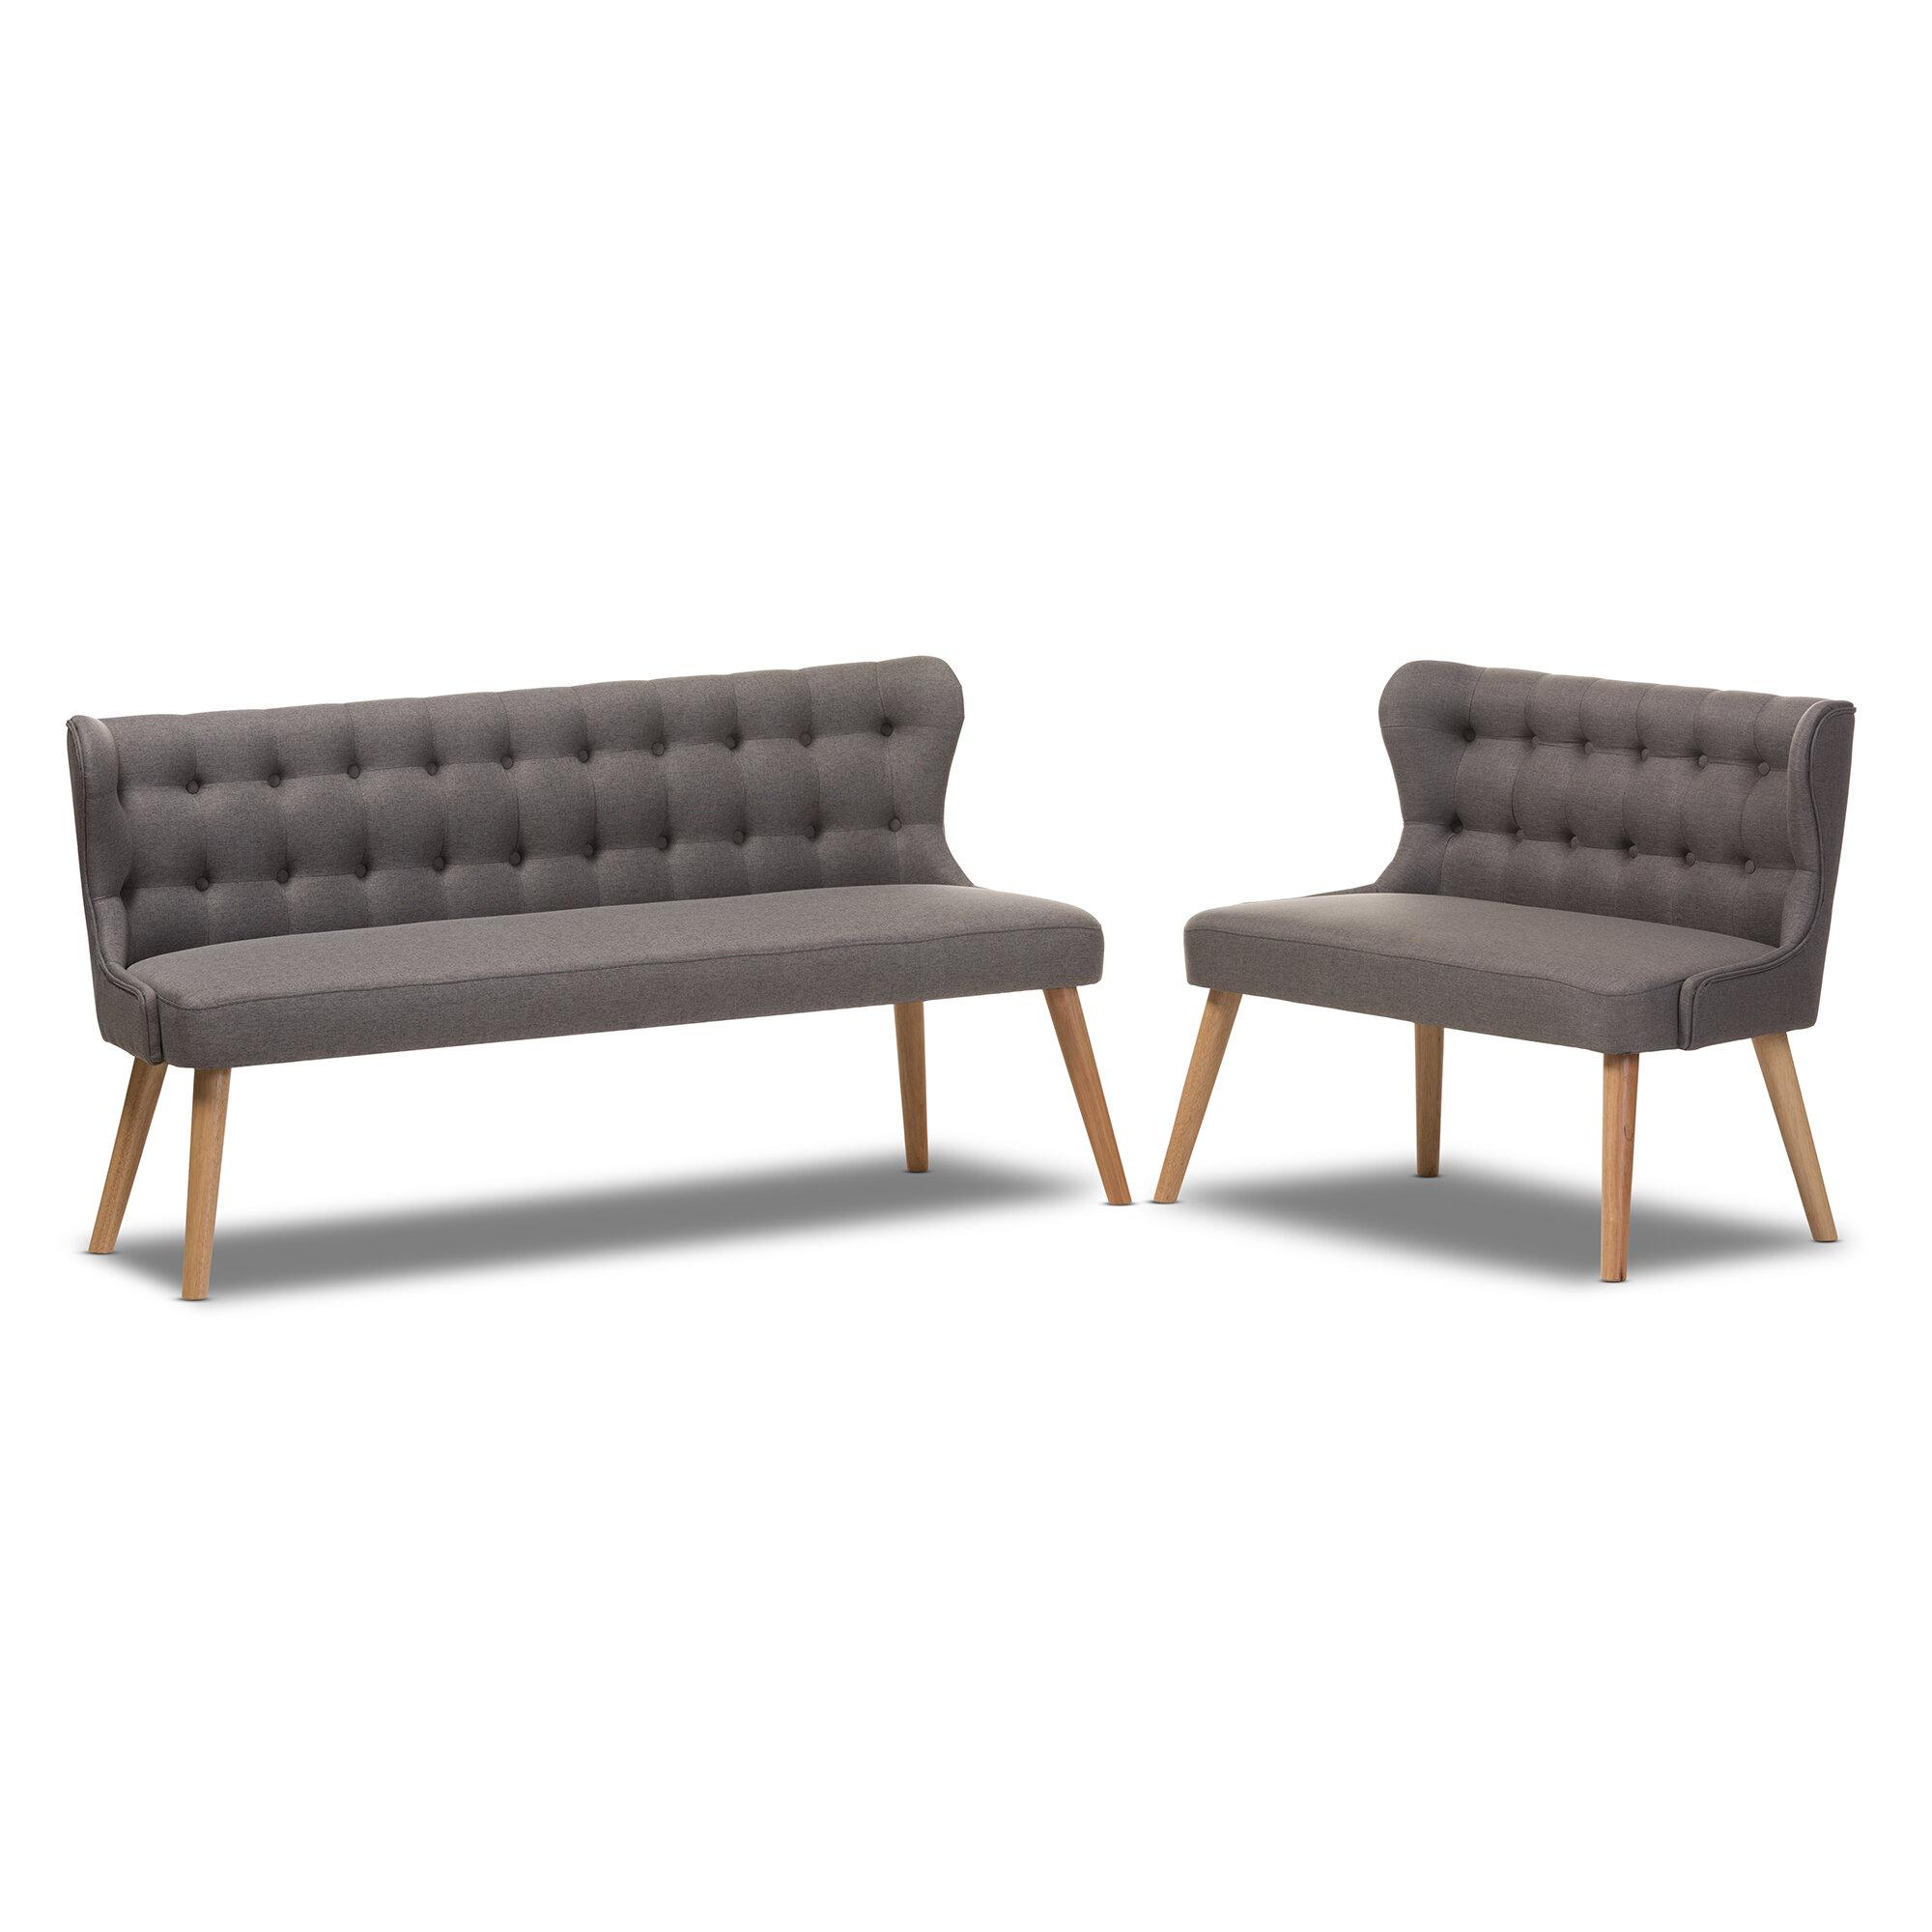 wholesale interiors alessia 2 piece living room set wayfair rh wayfair com Alessia Macy alessia leather sofa reviews